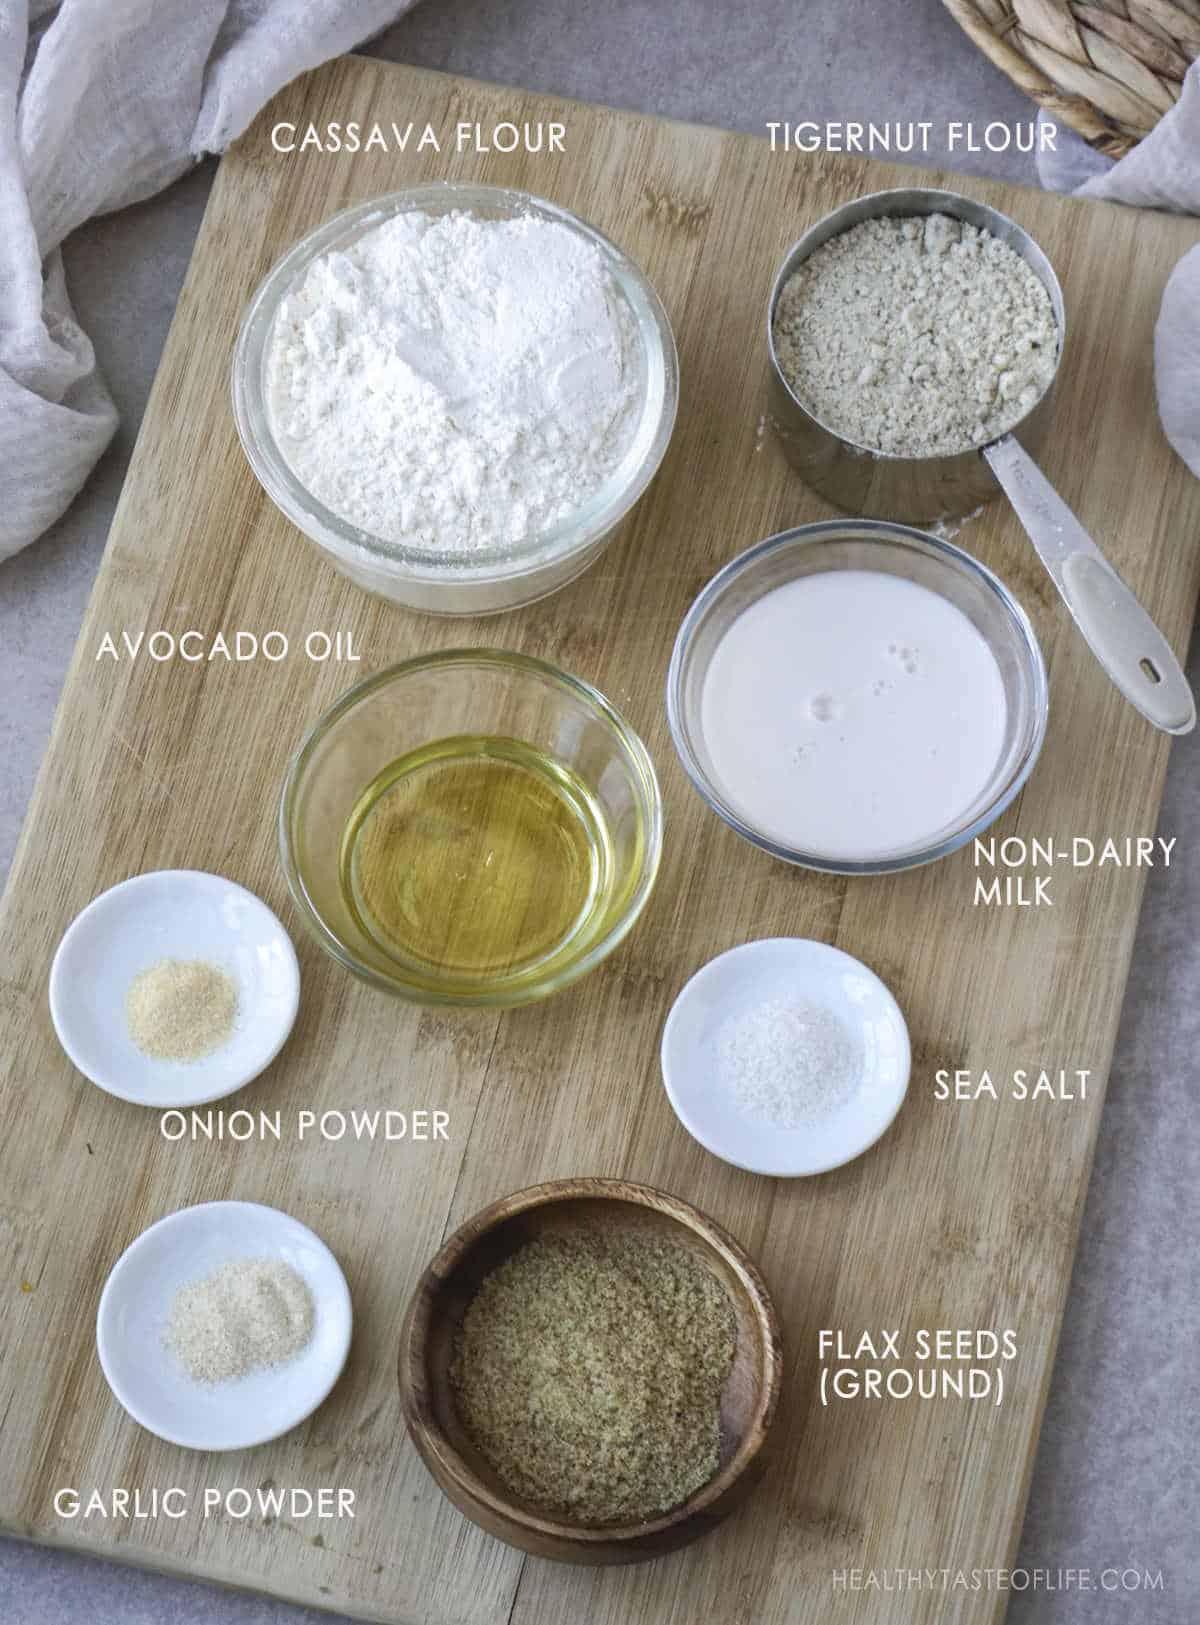 Ingredients for grain free crackers.